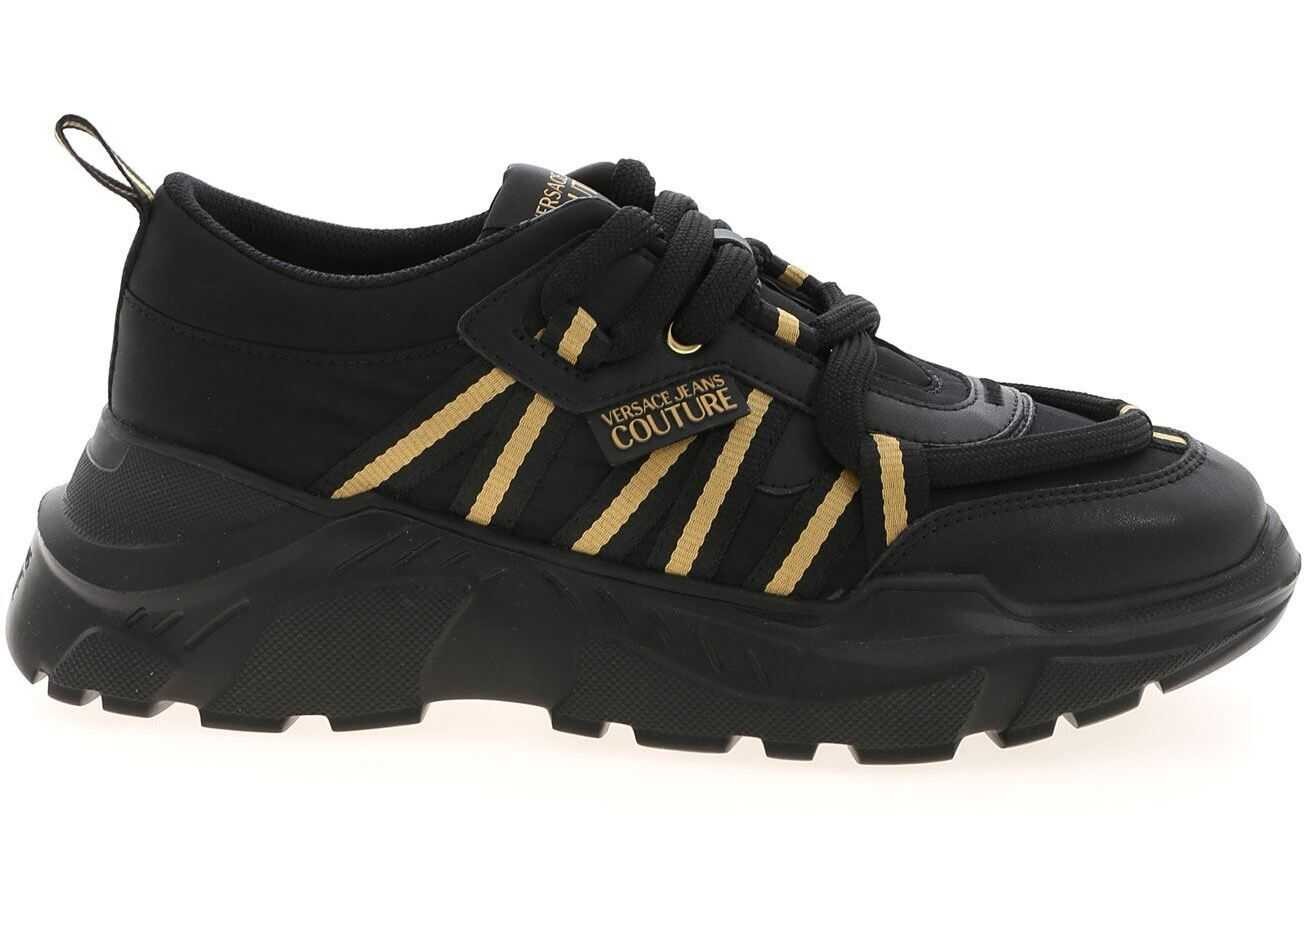 Versace Jeans Couture Golden Grosgrain Sneakers In Black E0YWASC371969899 Black imagine b-mall.ro